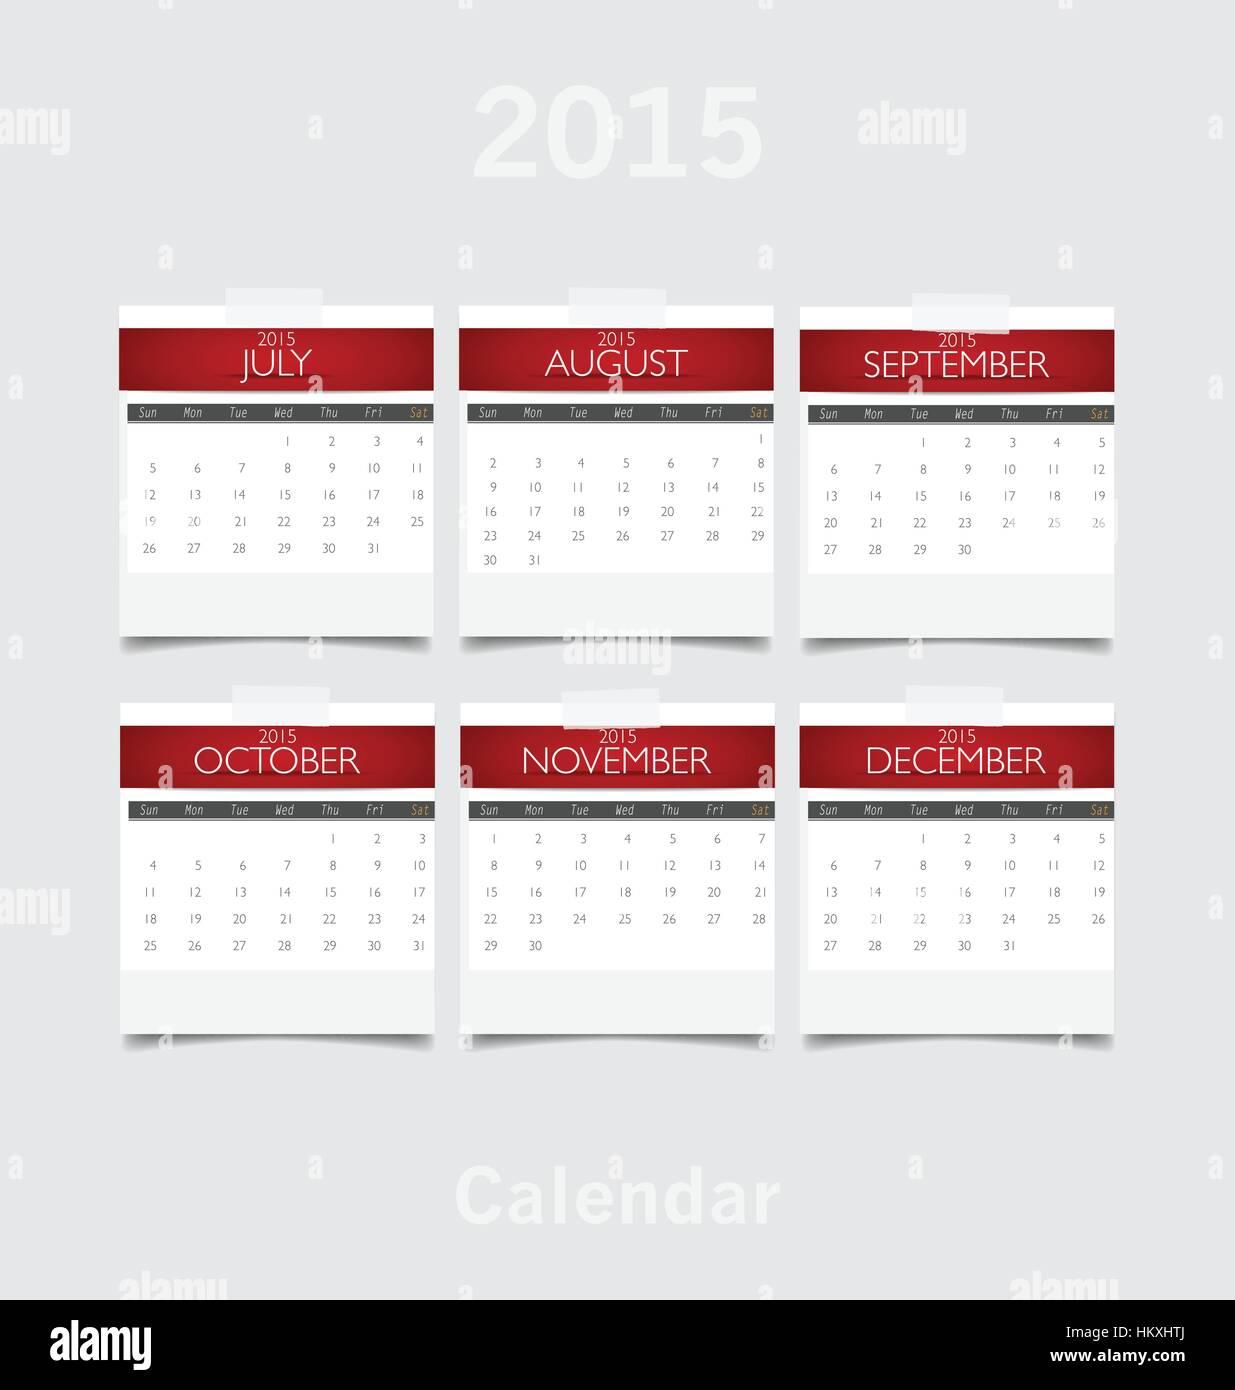 October November December Stock Photos & October November